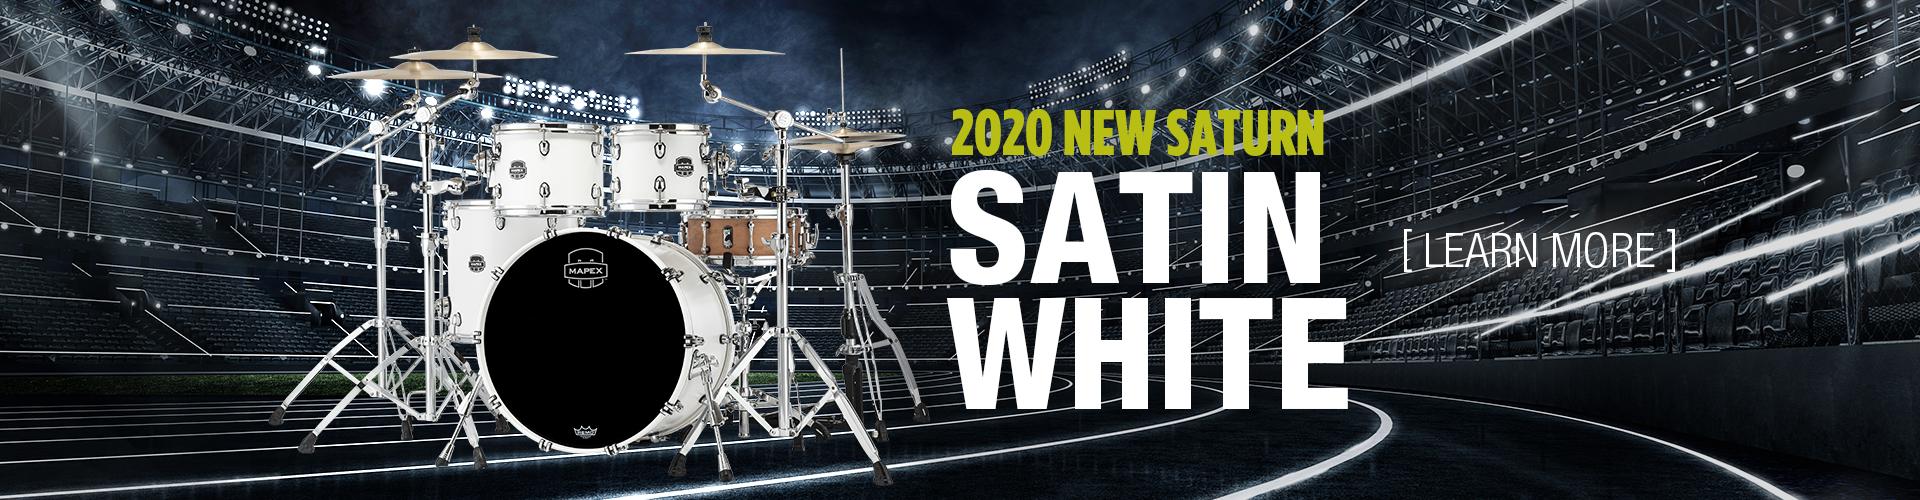 2020 Saturn Satin White